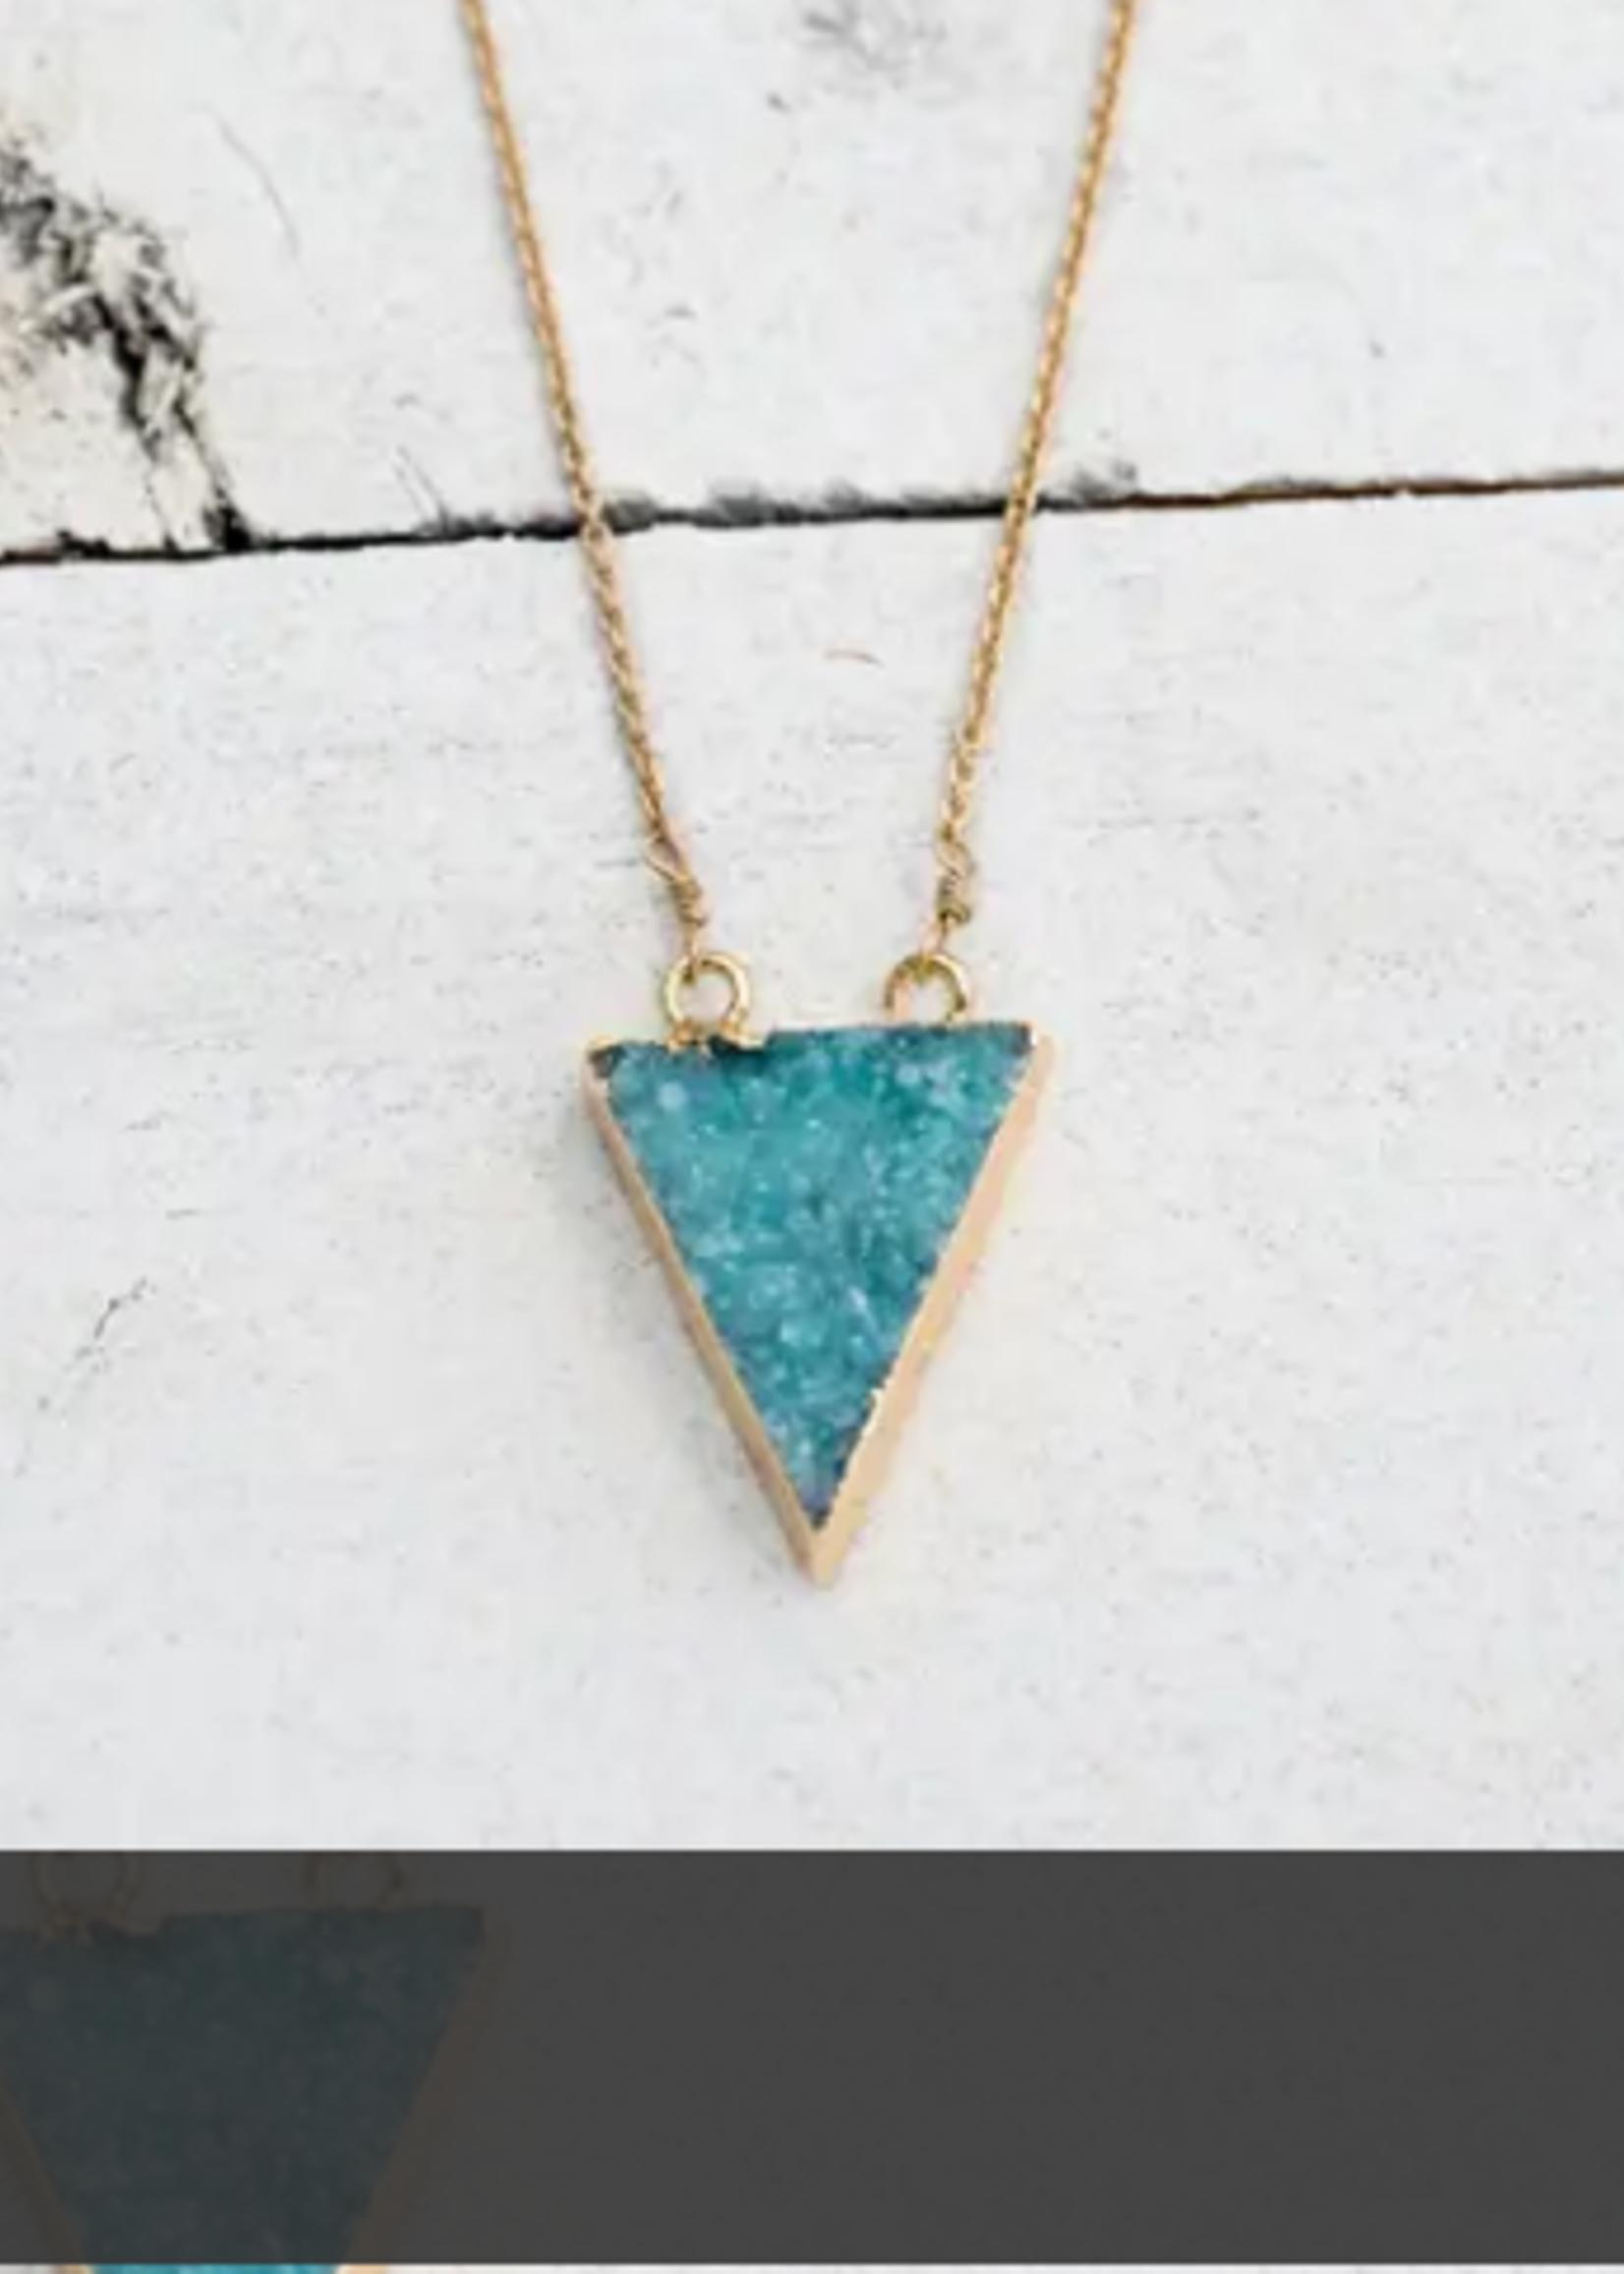 Wild Abandon Apex Necklace